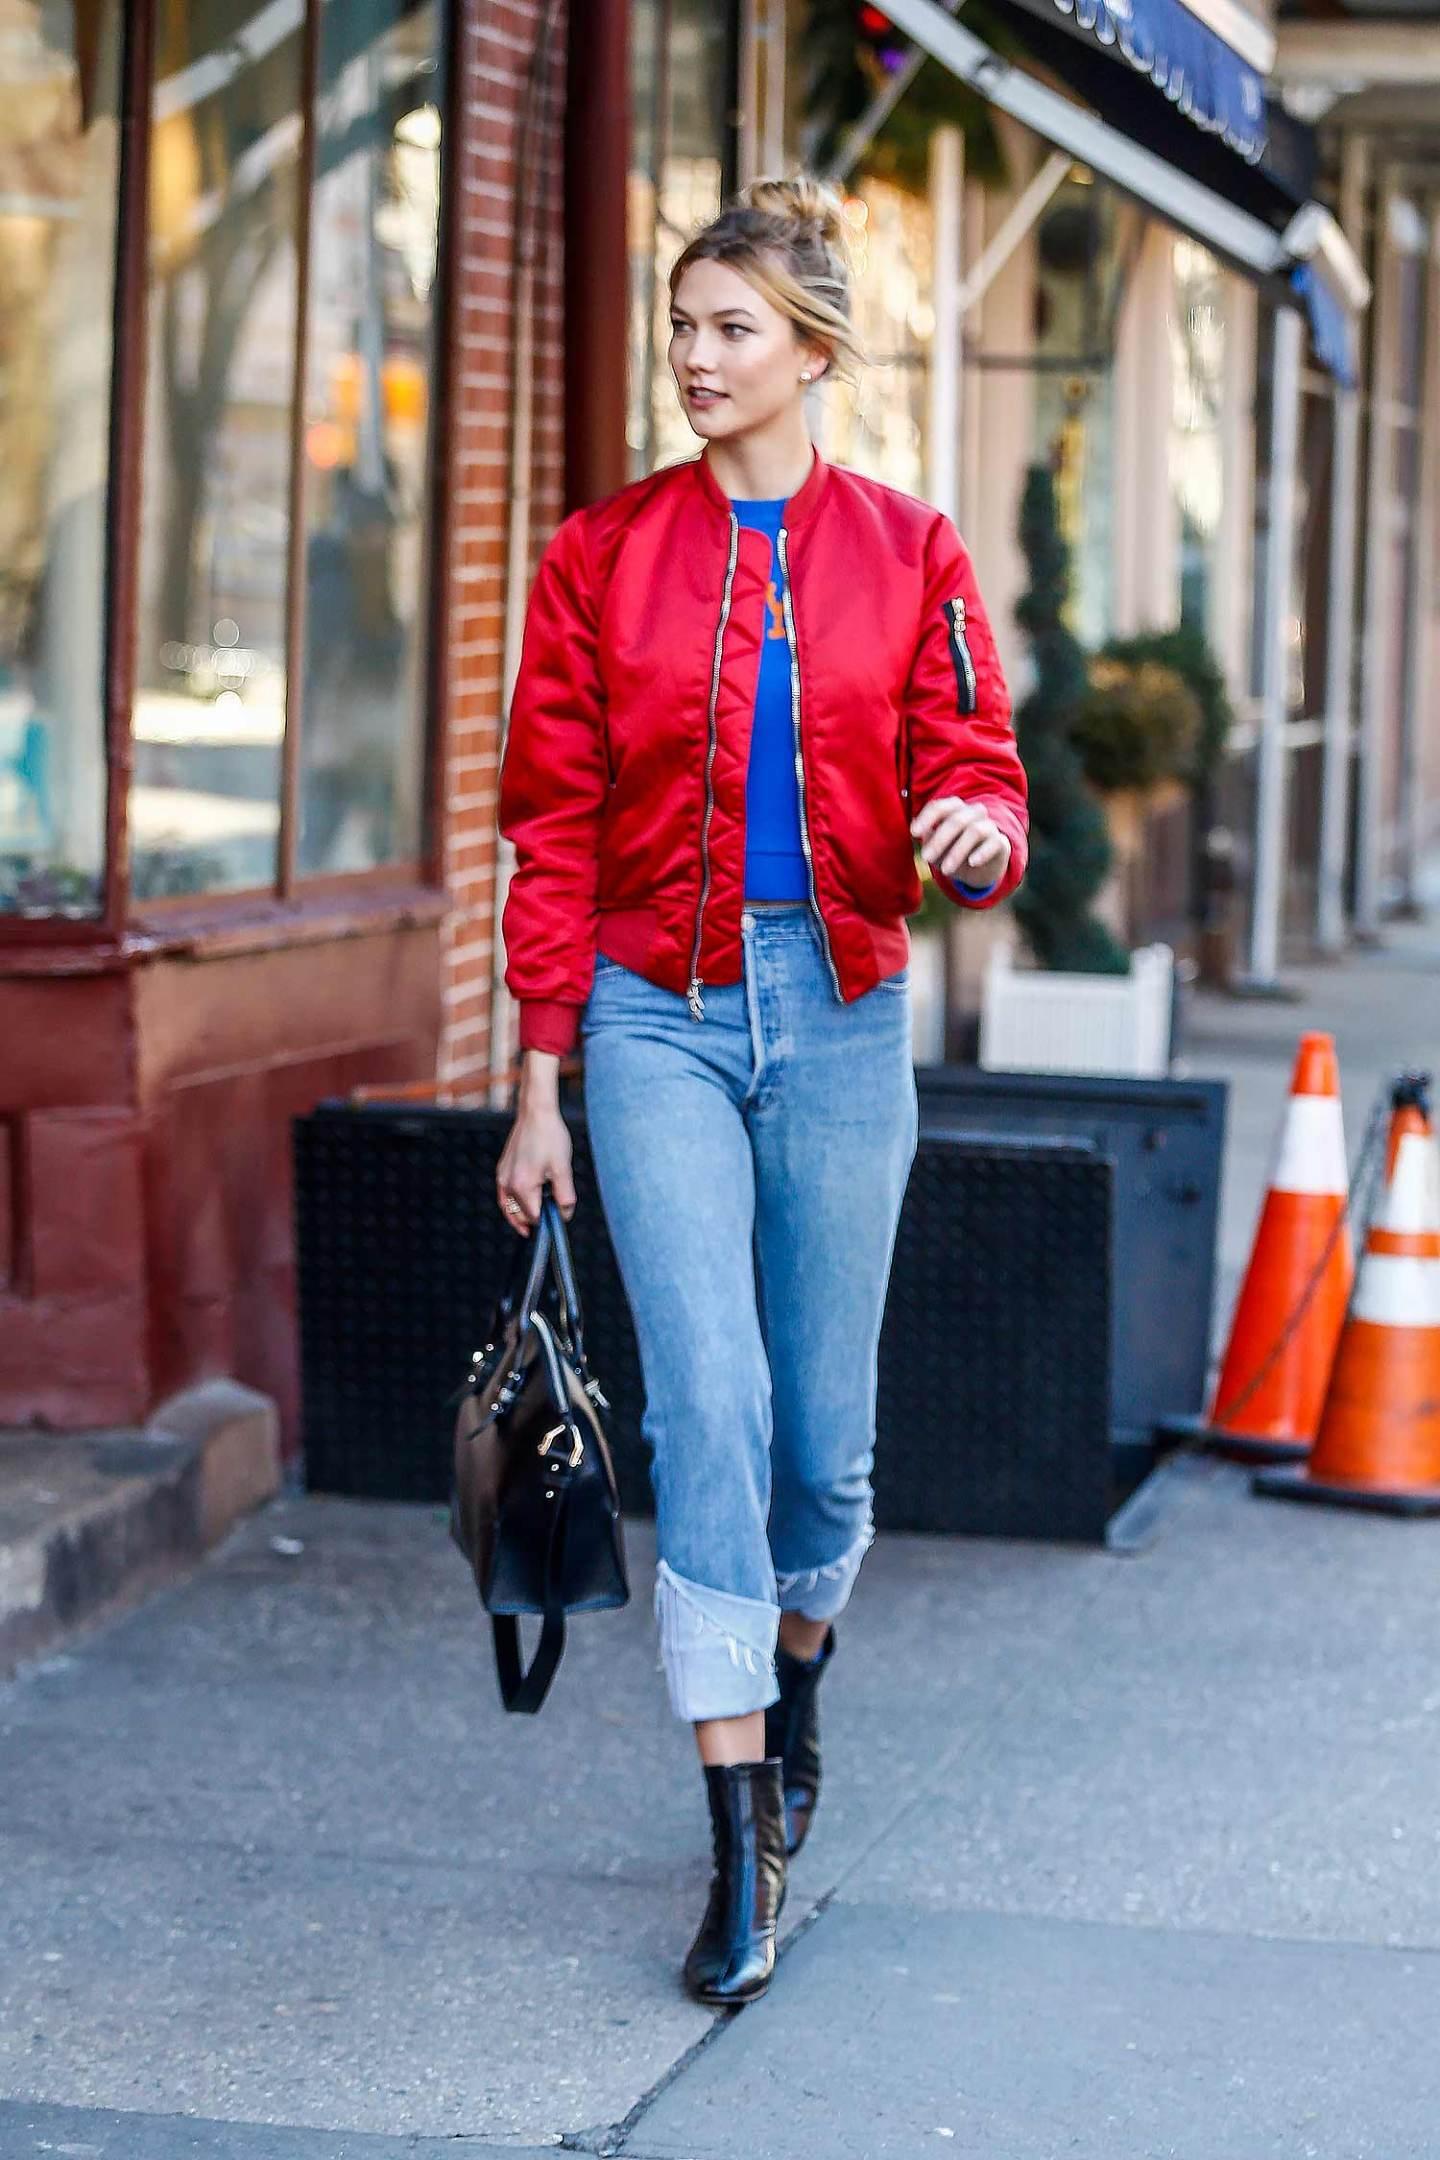 karlie-kloss-redone-levis-jeans-new